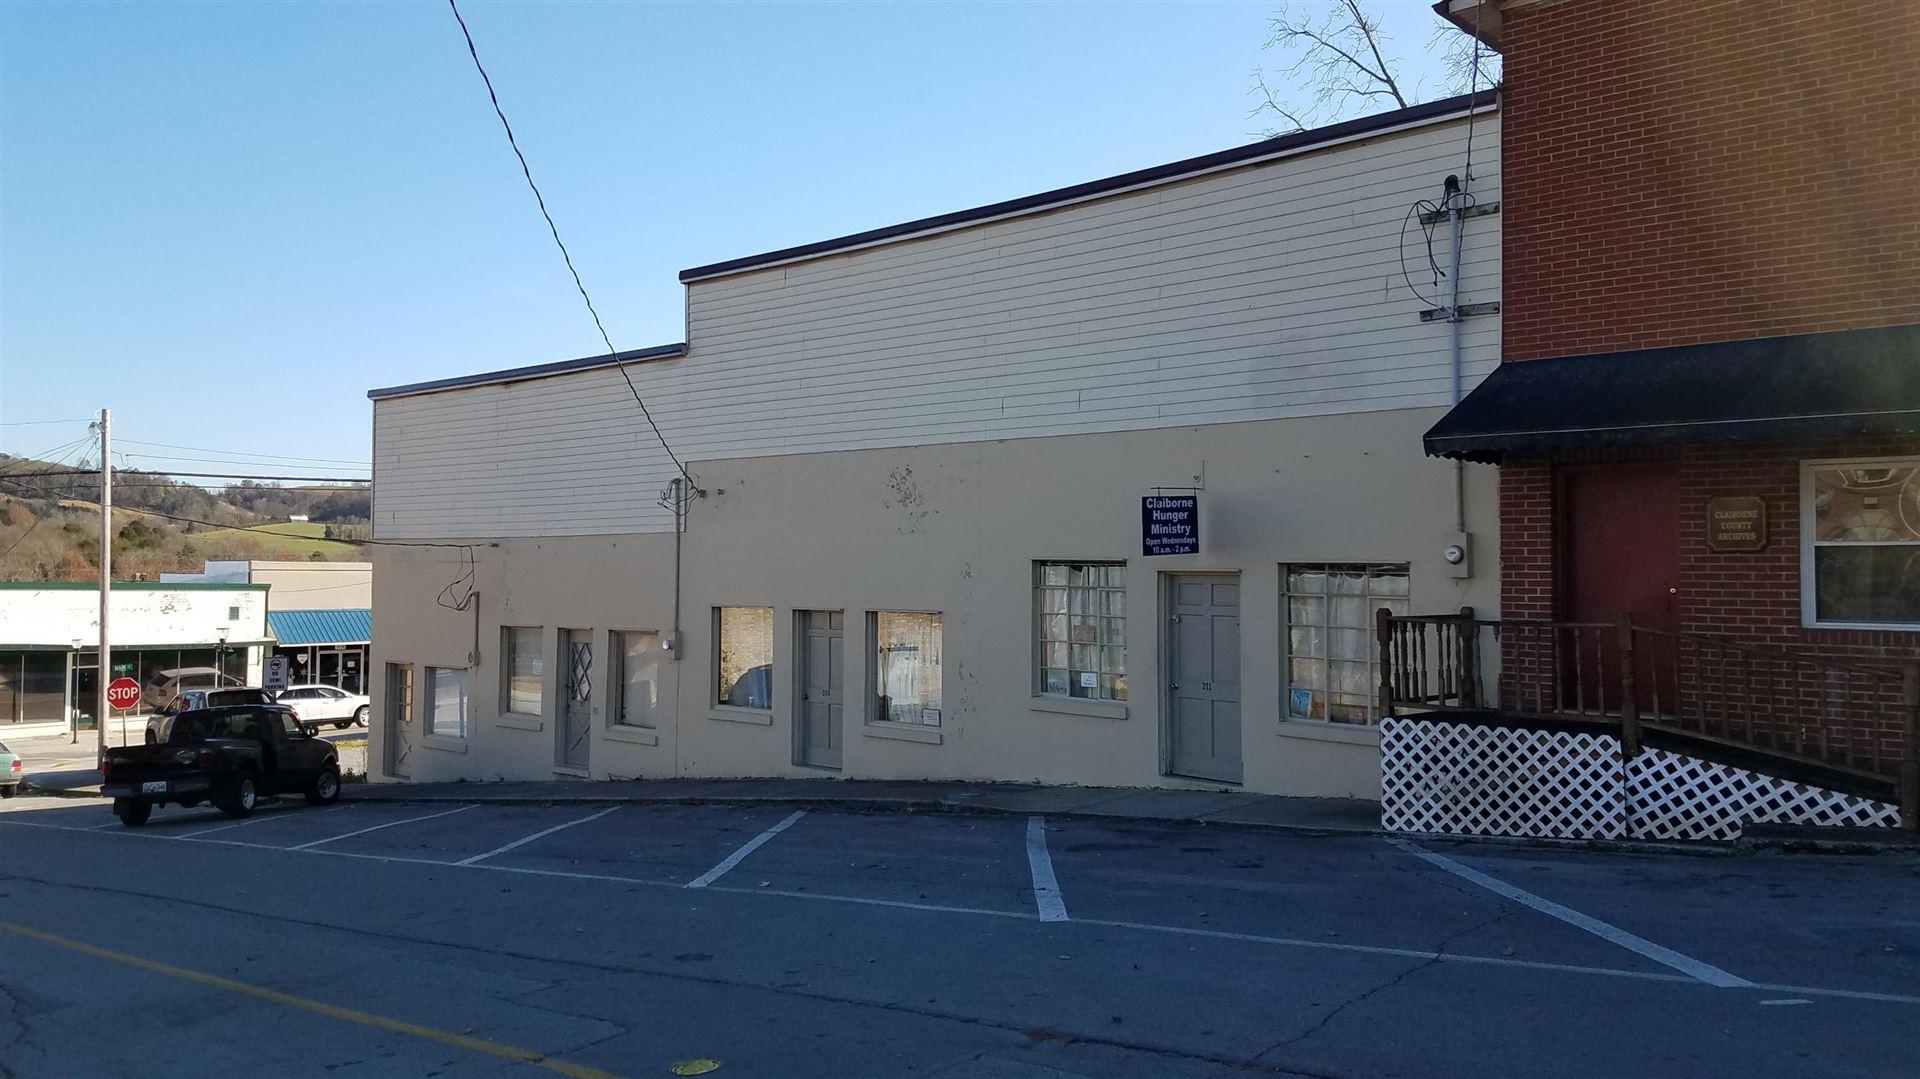 Photo of 207 Montgomery St, Tazewell, TN 37879 (MLS # 1135855)